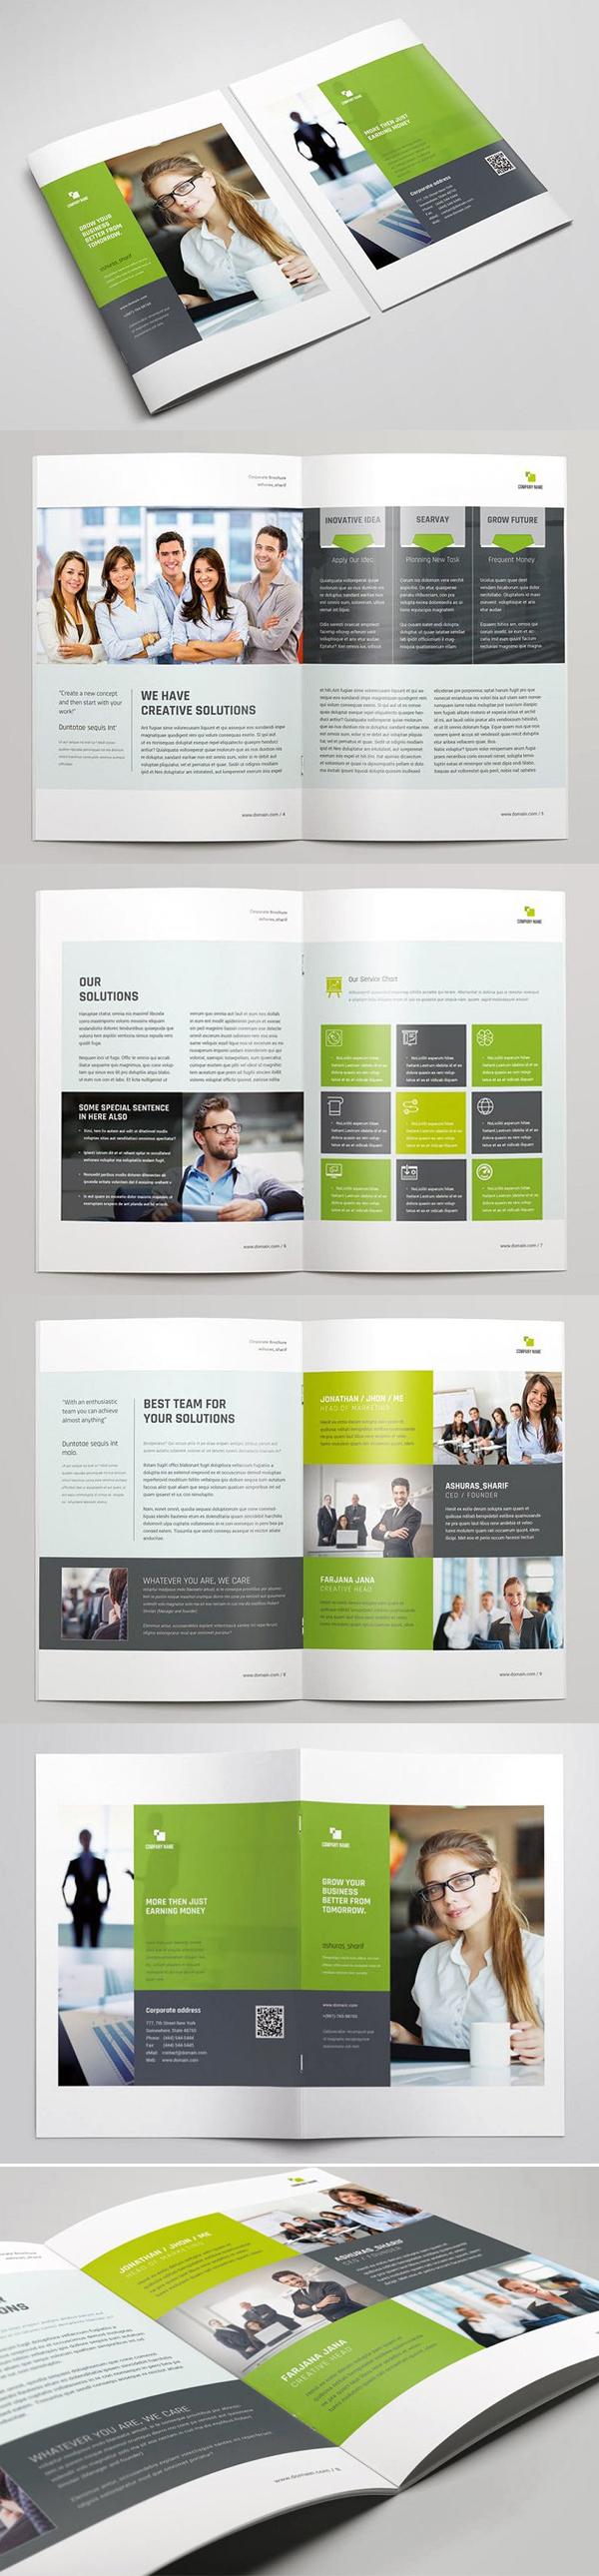 Brochure Annual Report Templates